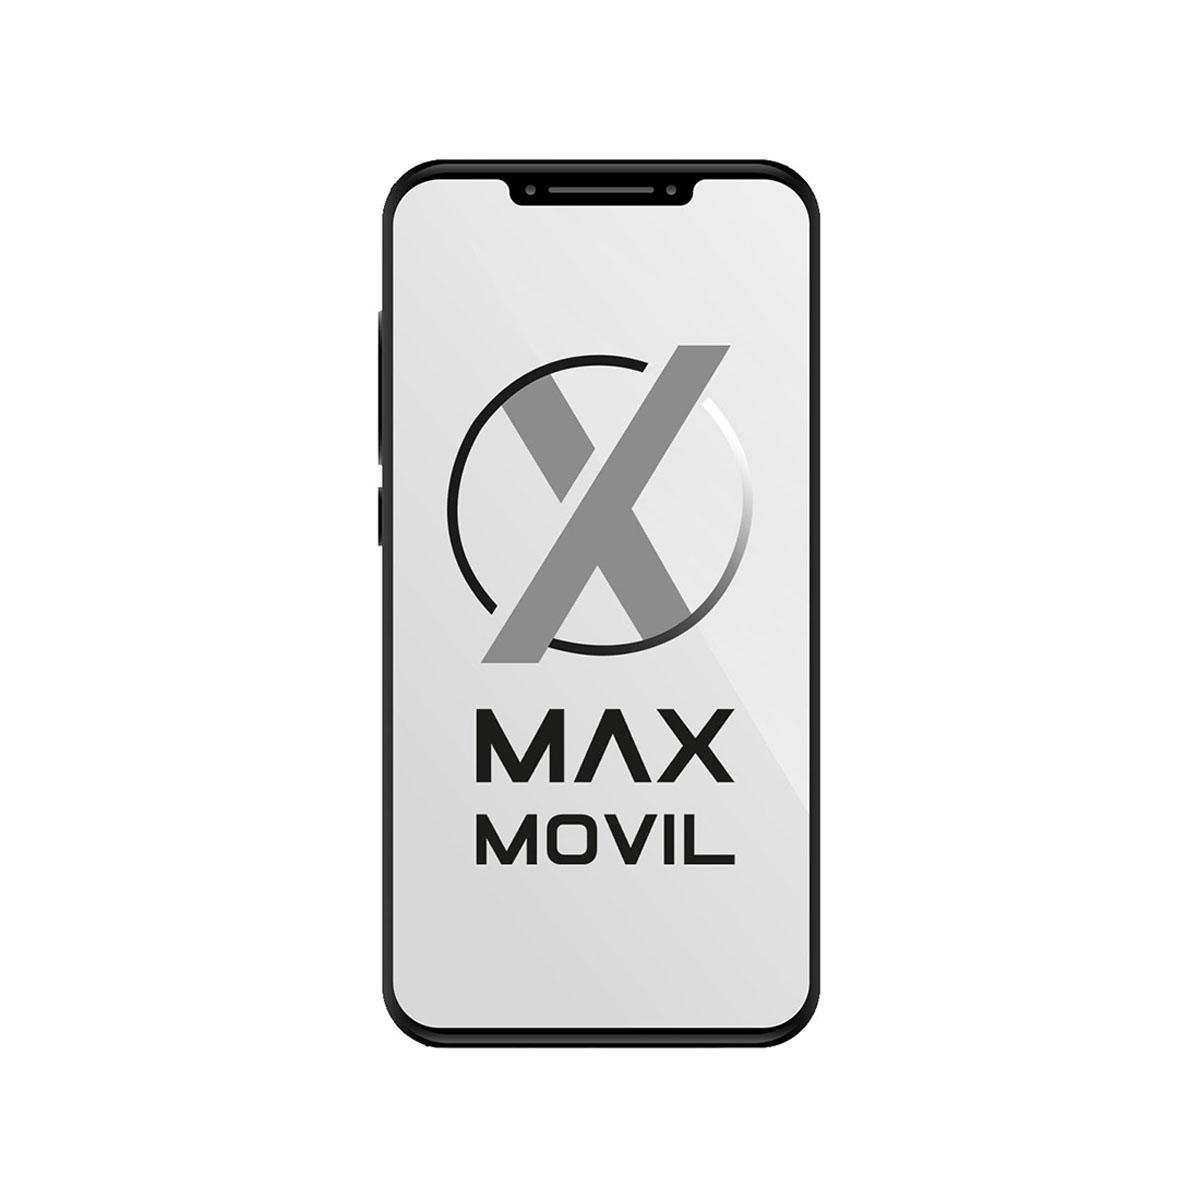 Teléfono inalámbrico GSM Xacom W-258